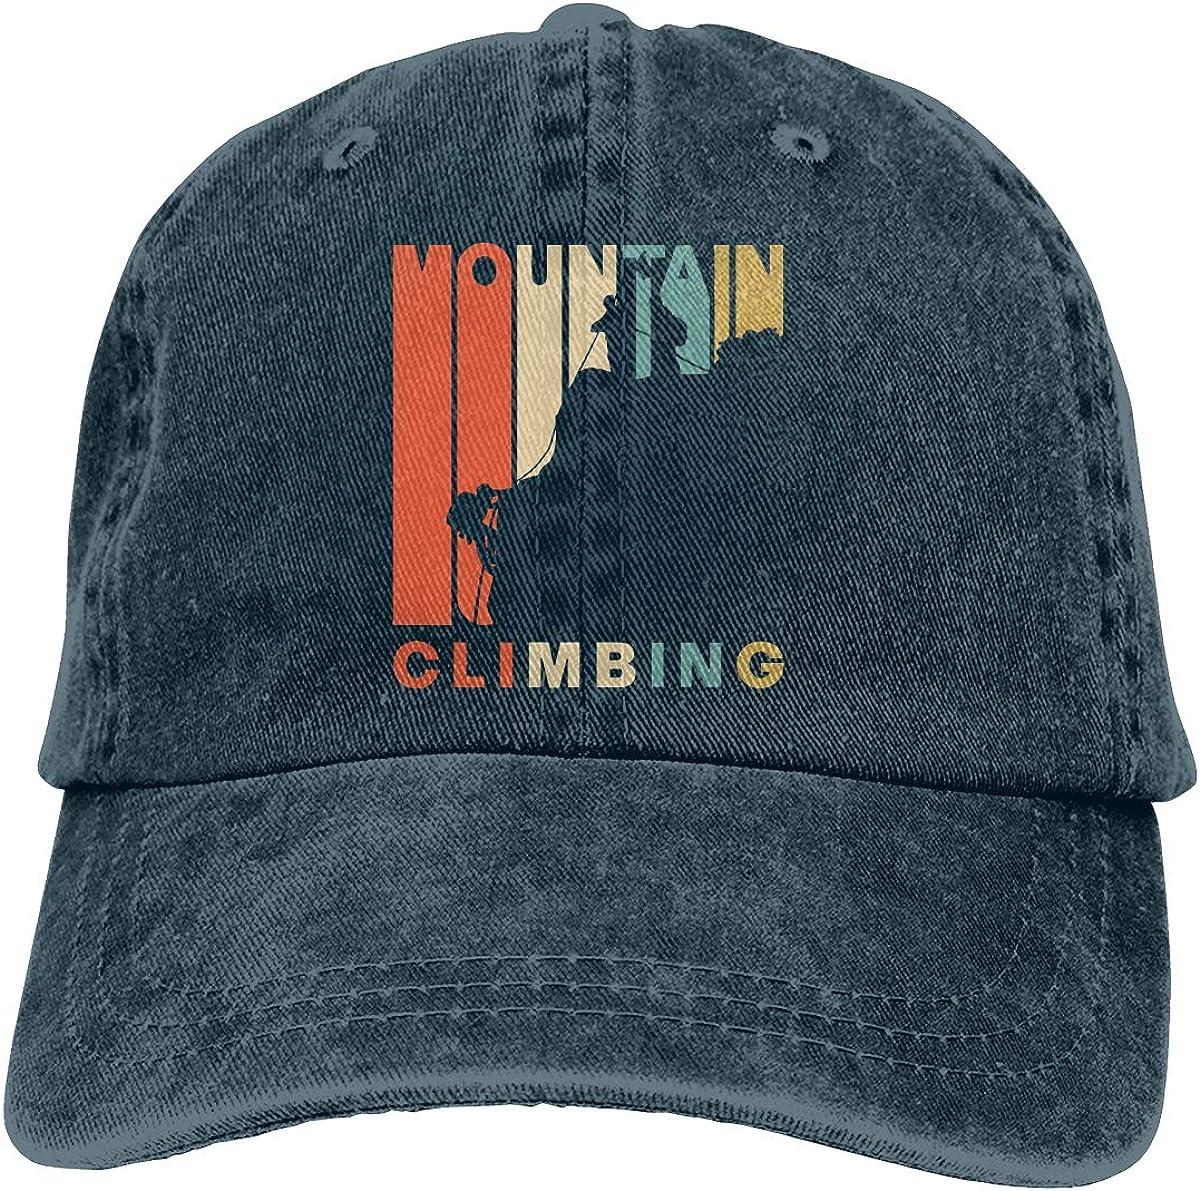 Vintage Style Mountain Climbing Mens Womens Adjustable Yarn-Dyed Baseball Cap Sports Hat